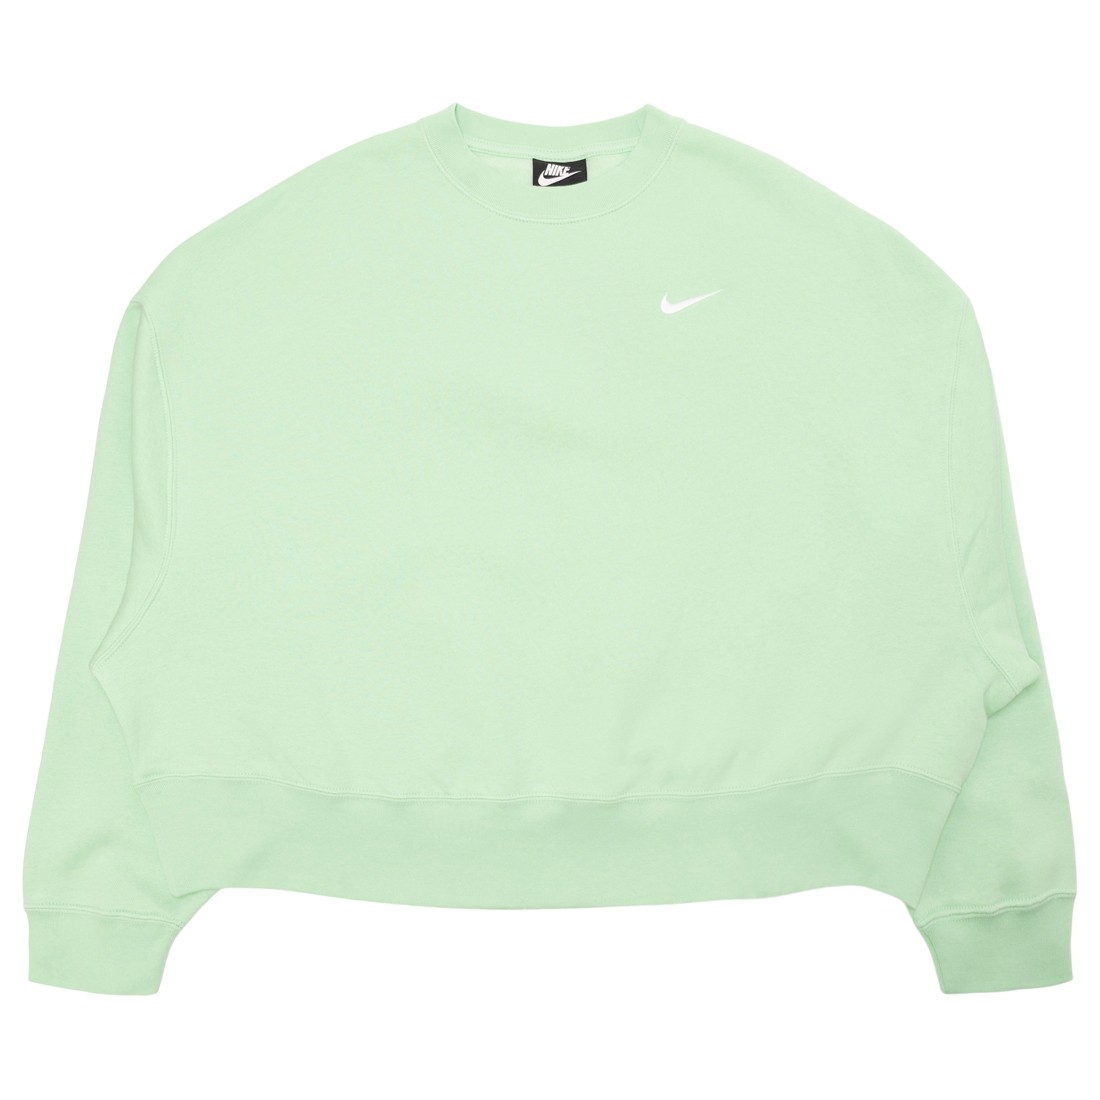 Nike Women Sportswear Essential Crewneck (cucumber calm / white)